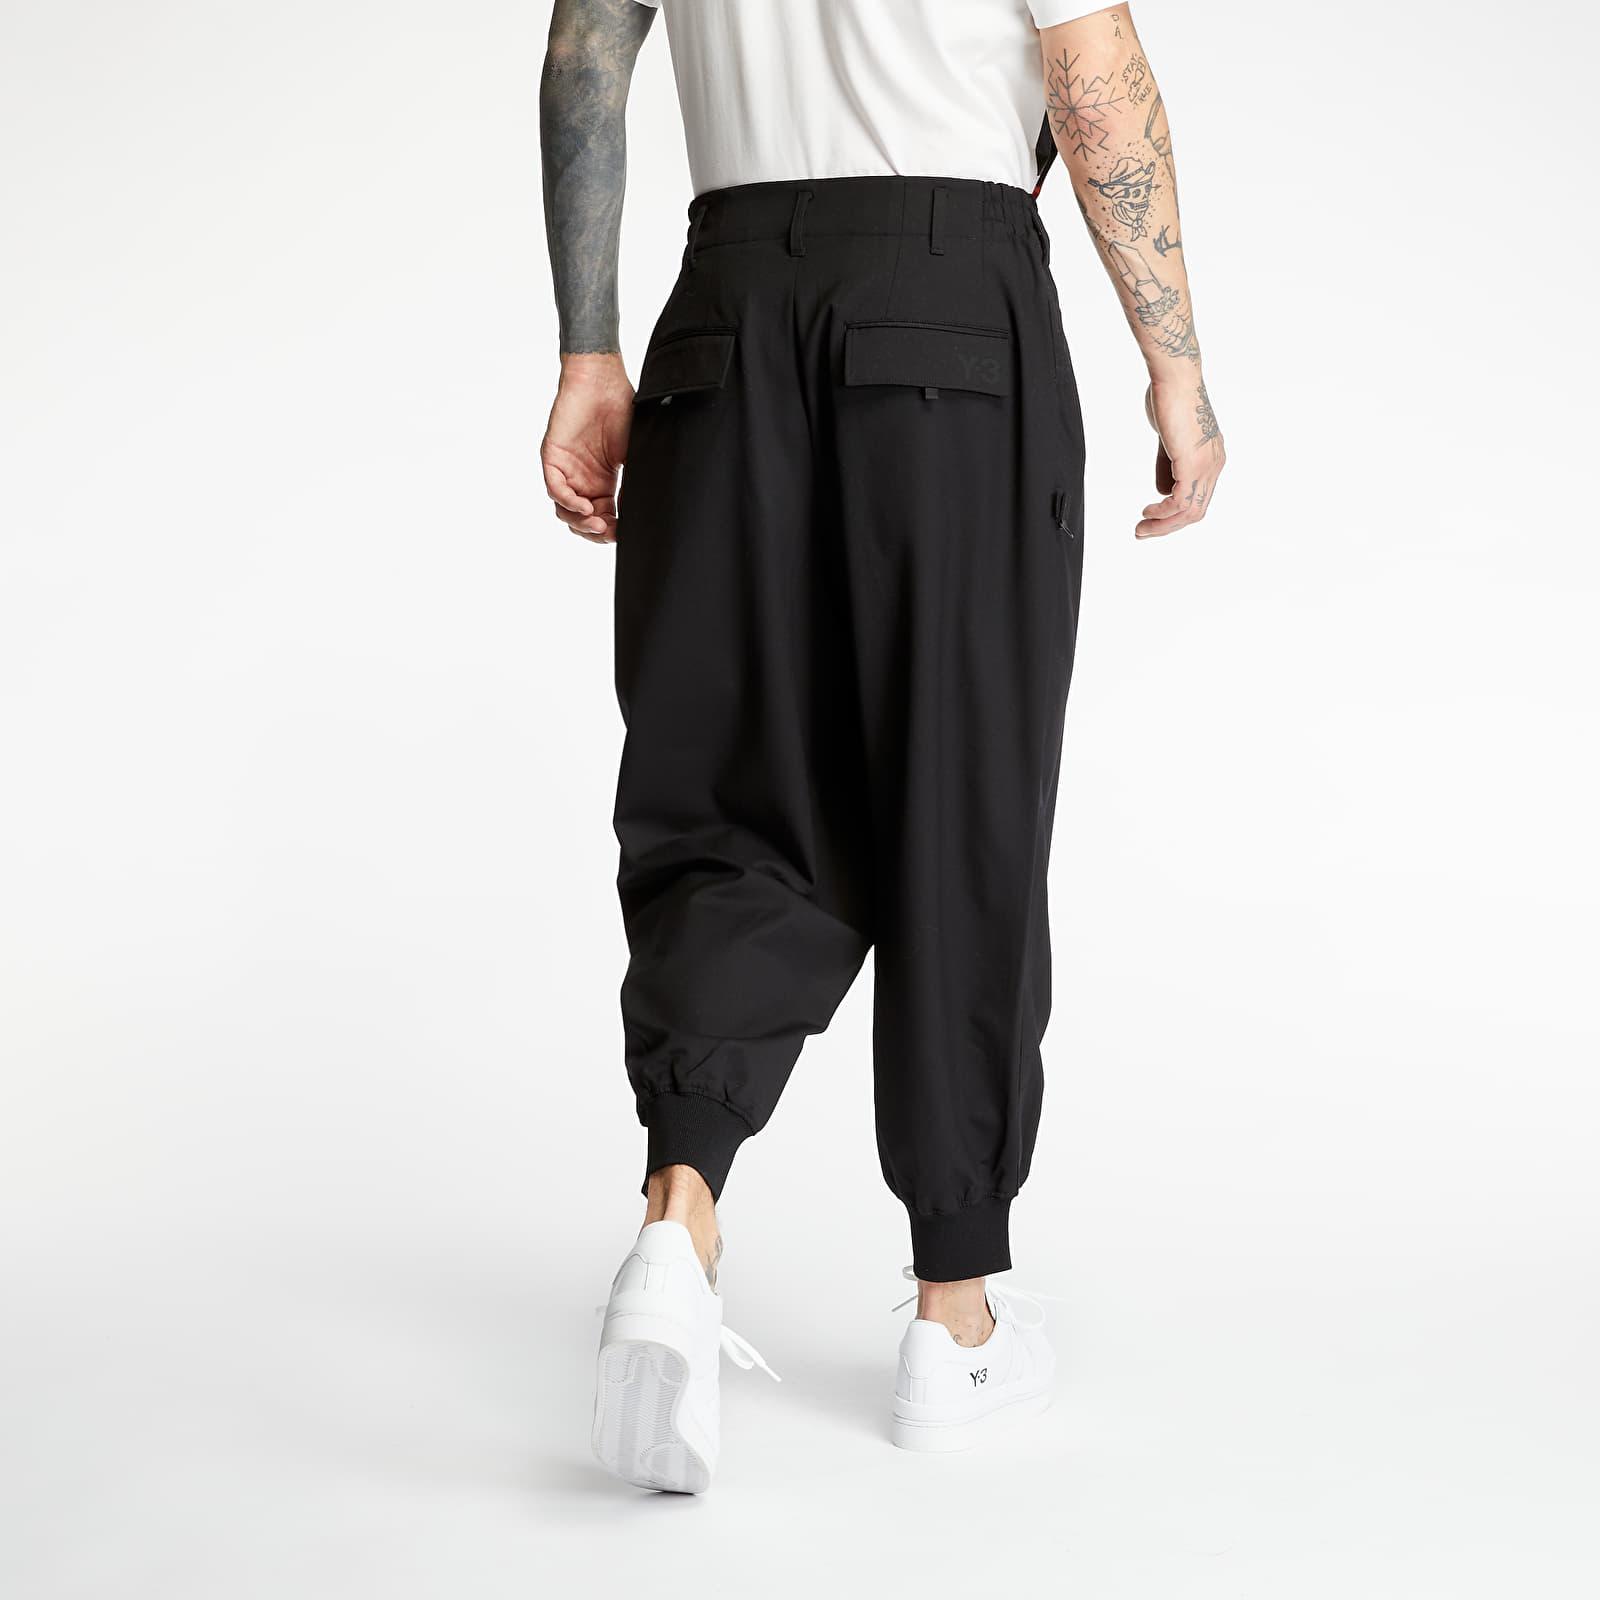 Pants and jeans Y-3 Pants Black